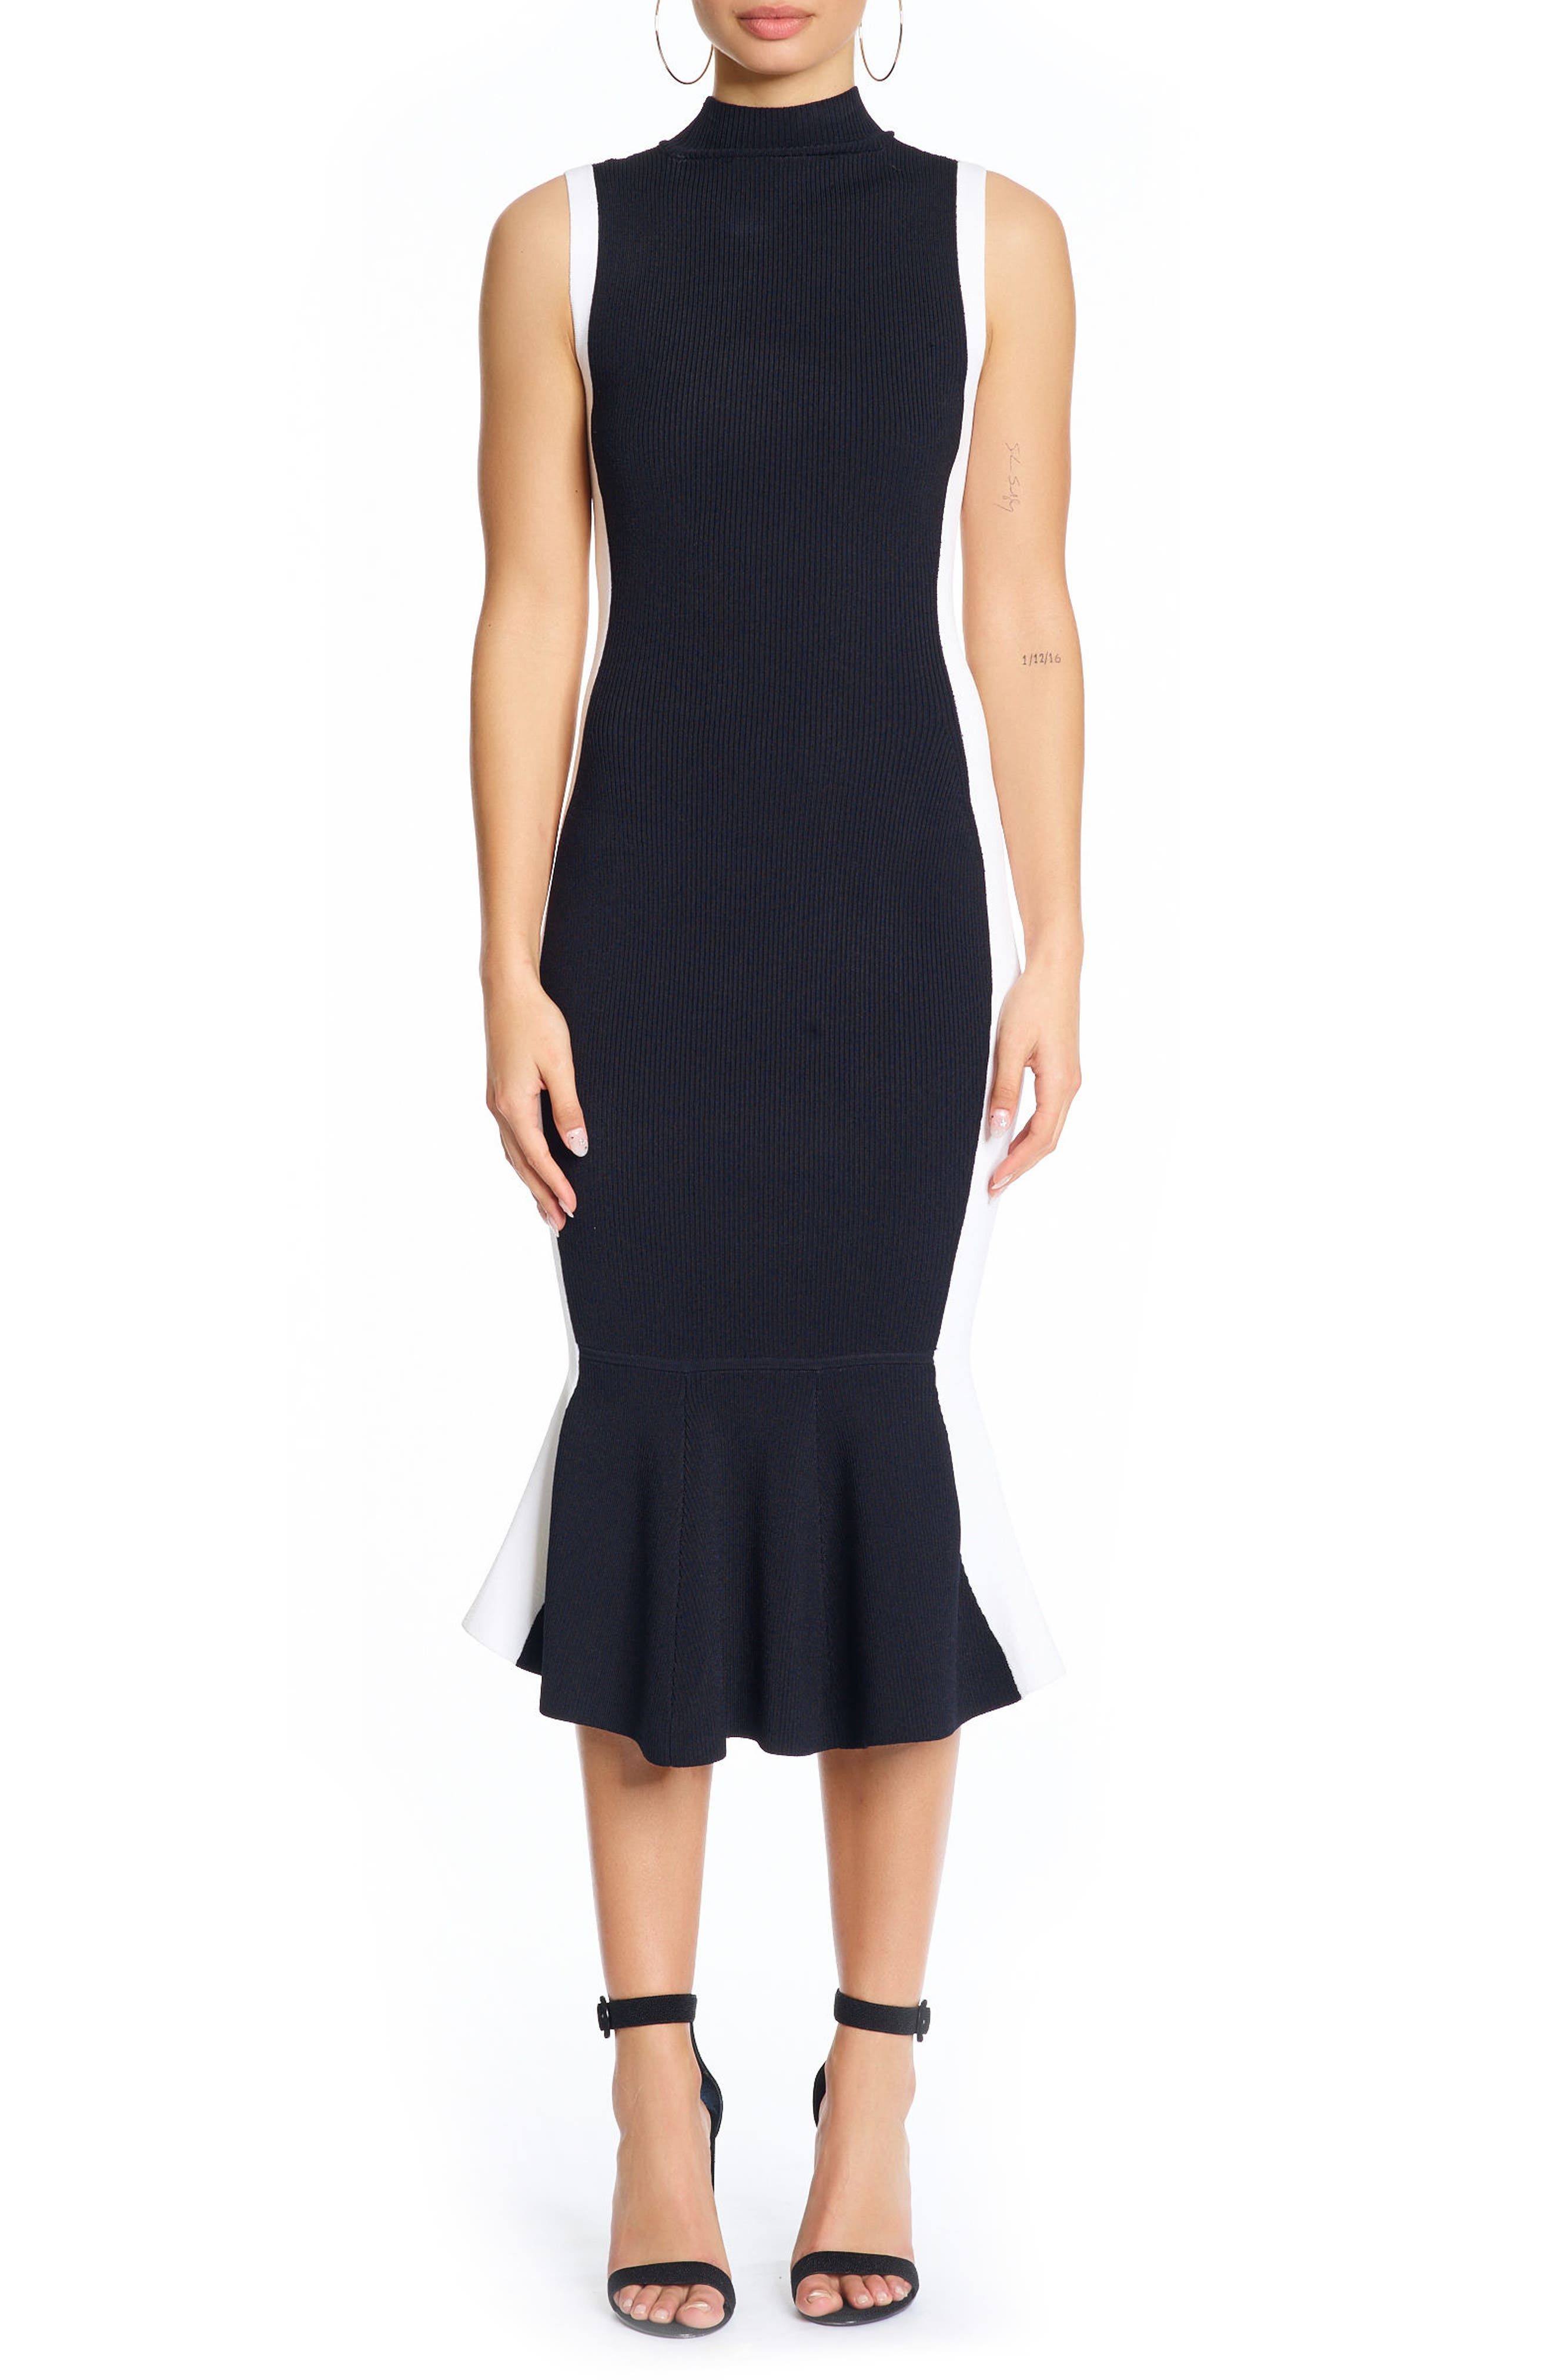 Main Image - KENDALL + KYLIE Illusion Peplum Dress